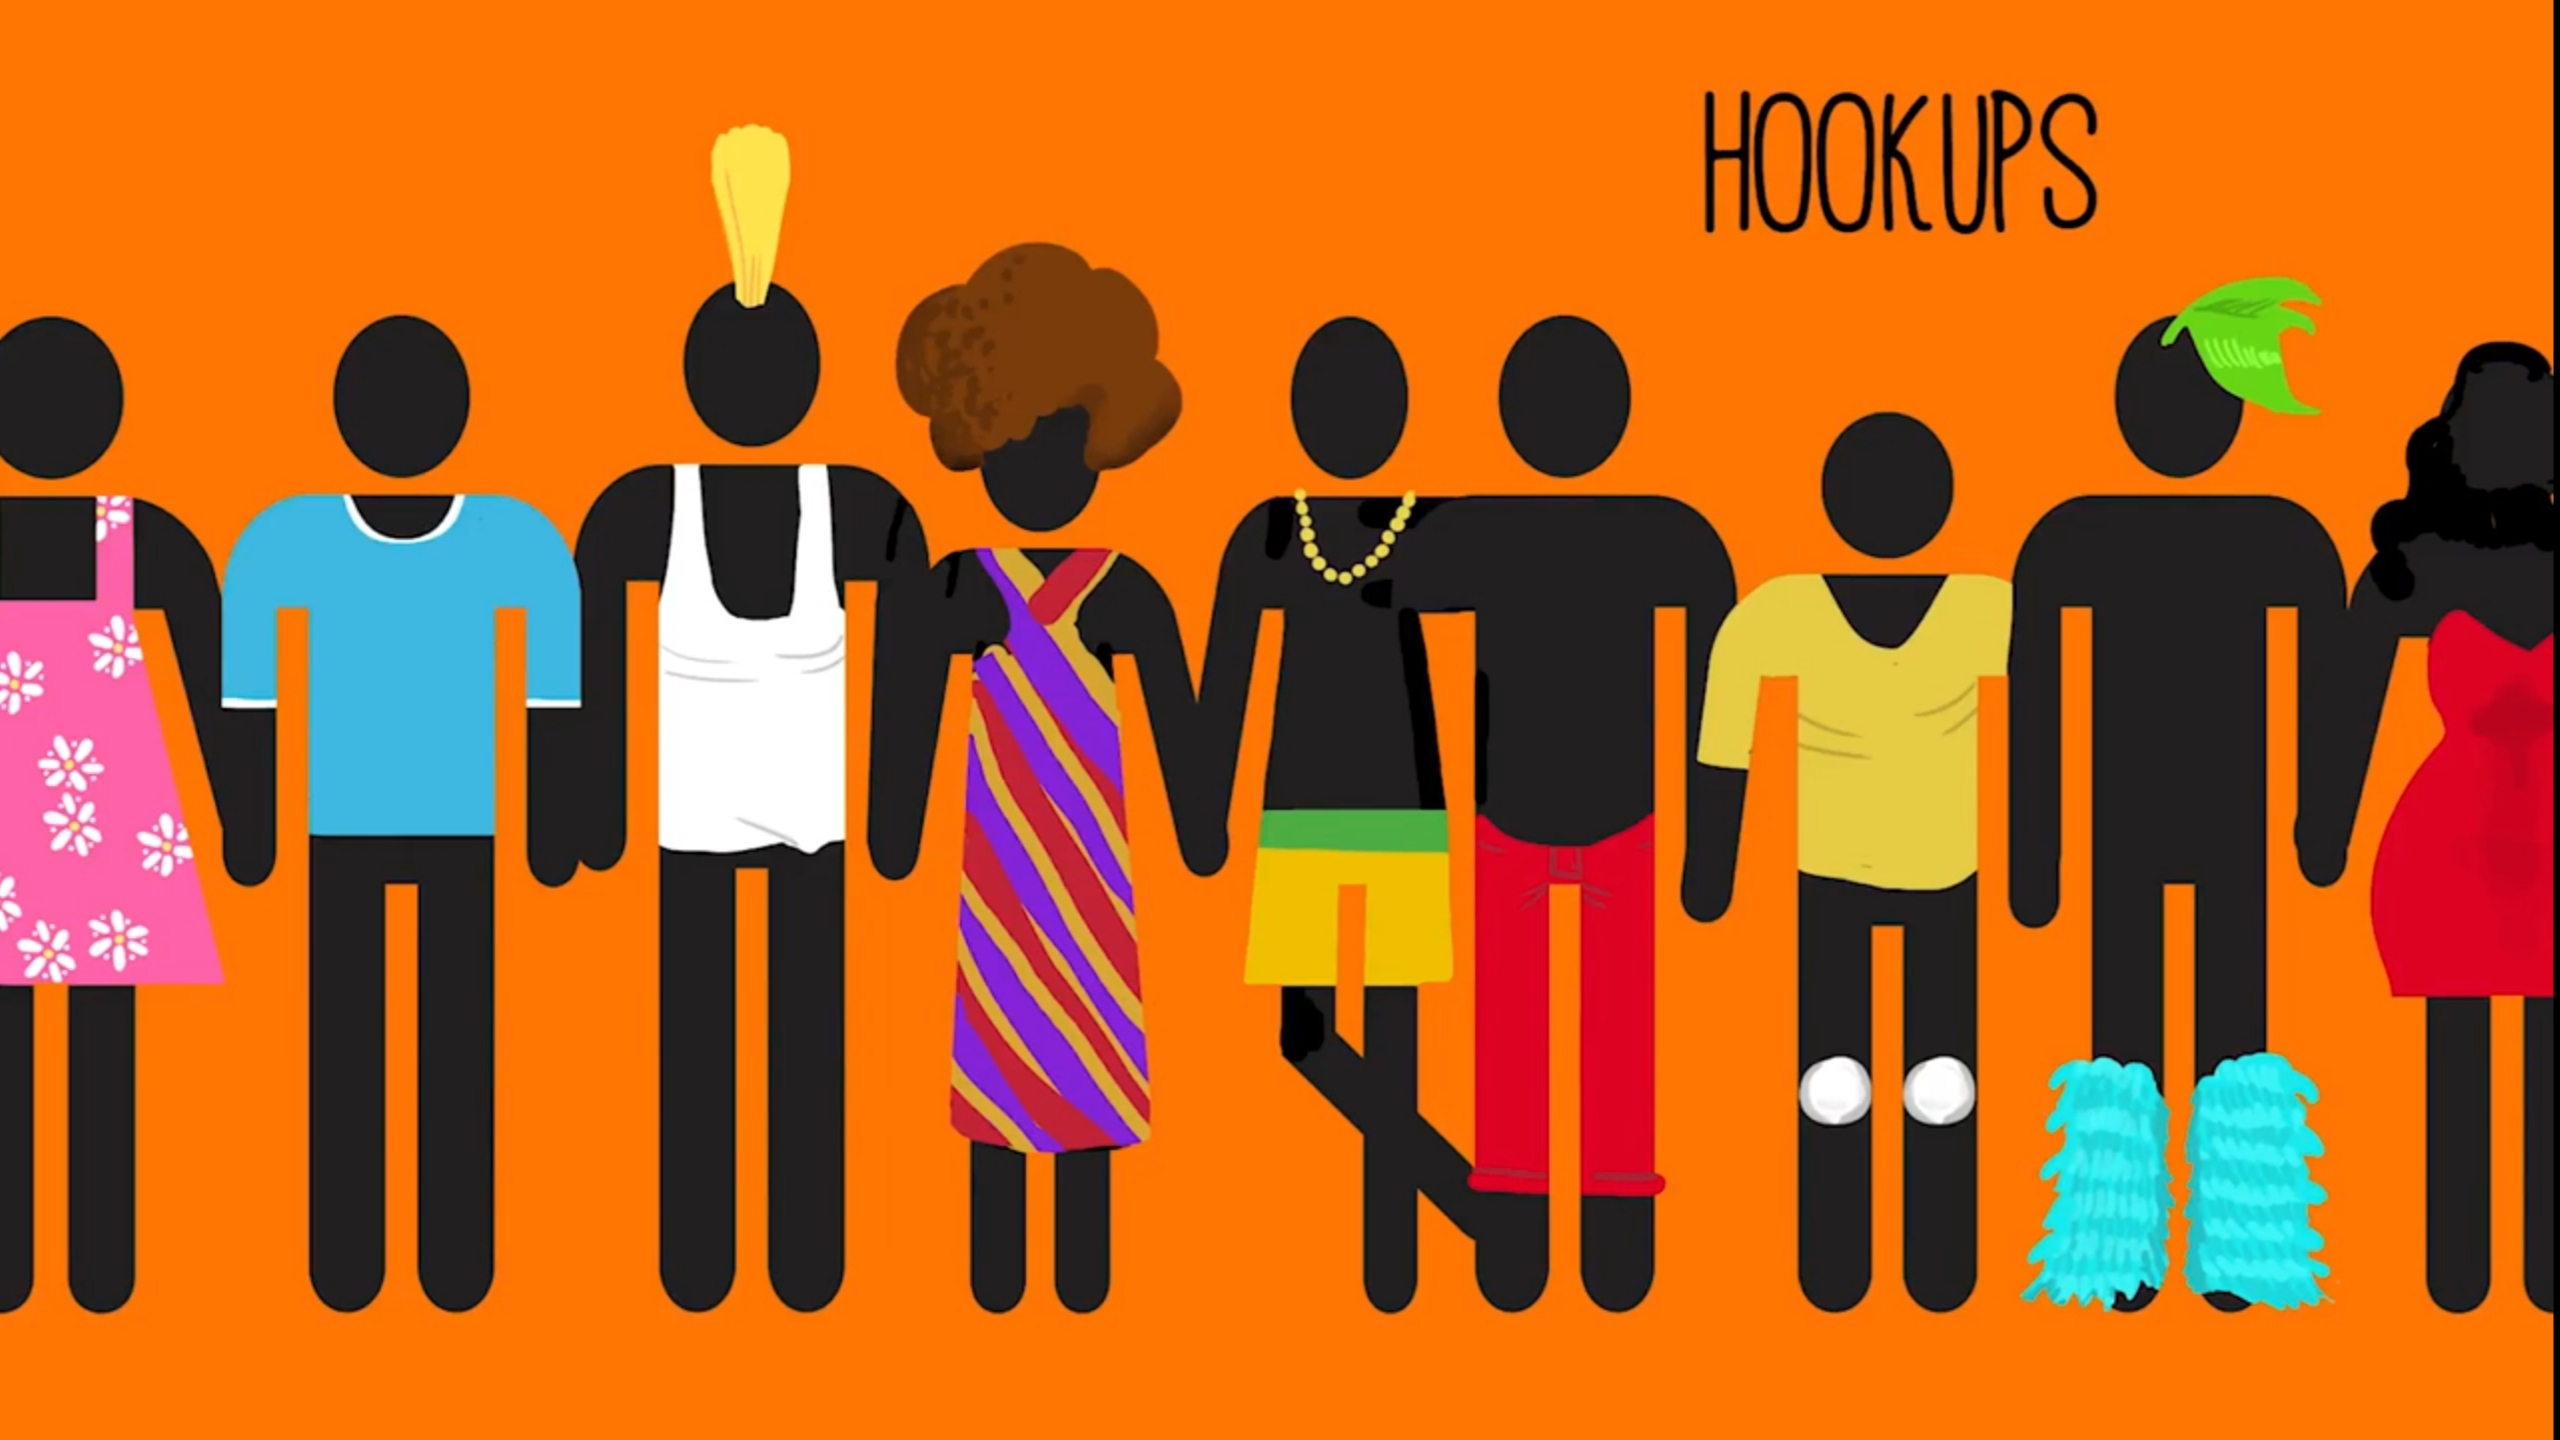 Hook up vs making love